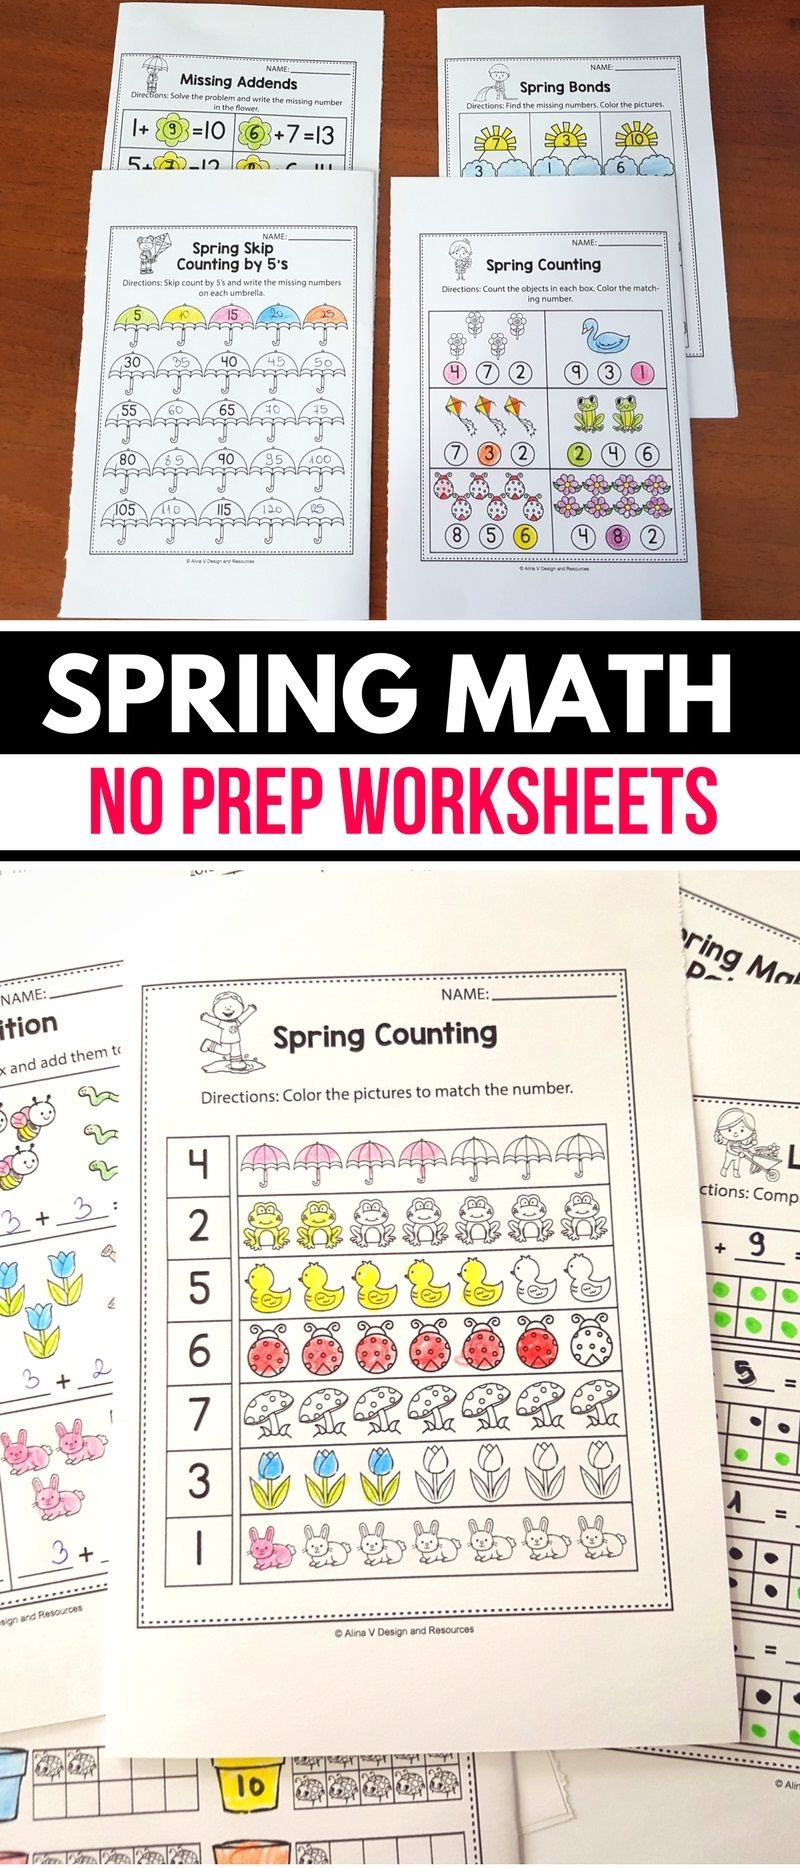 Free Spring Math Worksheets And Activities For Preschool Kindergarten And 1st Grade Kids Spring Math Worksheets Kindergarten Math Worksheets Math Worksheets [ 1868 x 800 Pixel ]